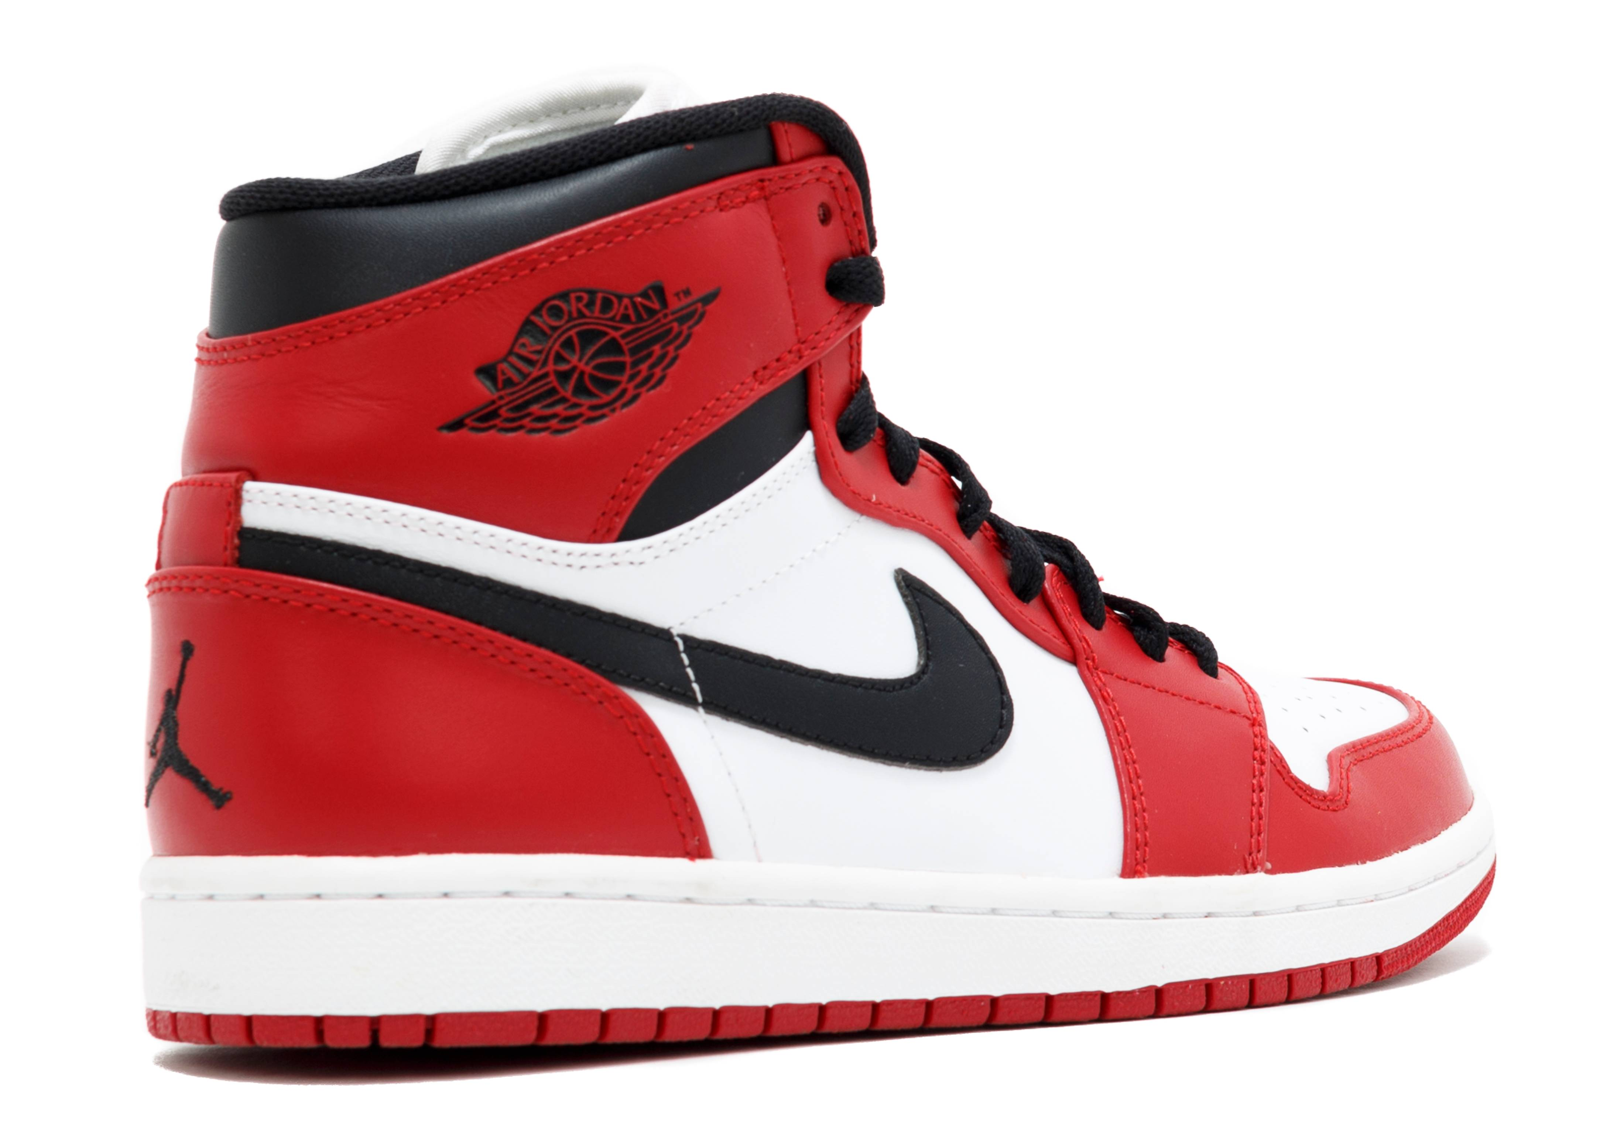 promo code 2f5d6 2b4a3 air jordan i 1 mid black gym red 554724 020 4  jordan 1 black white red